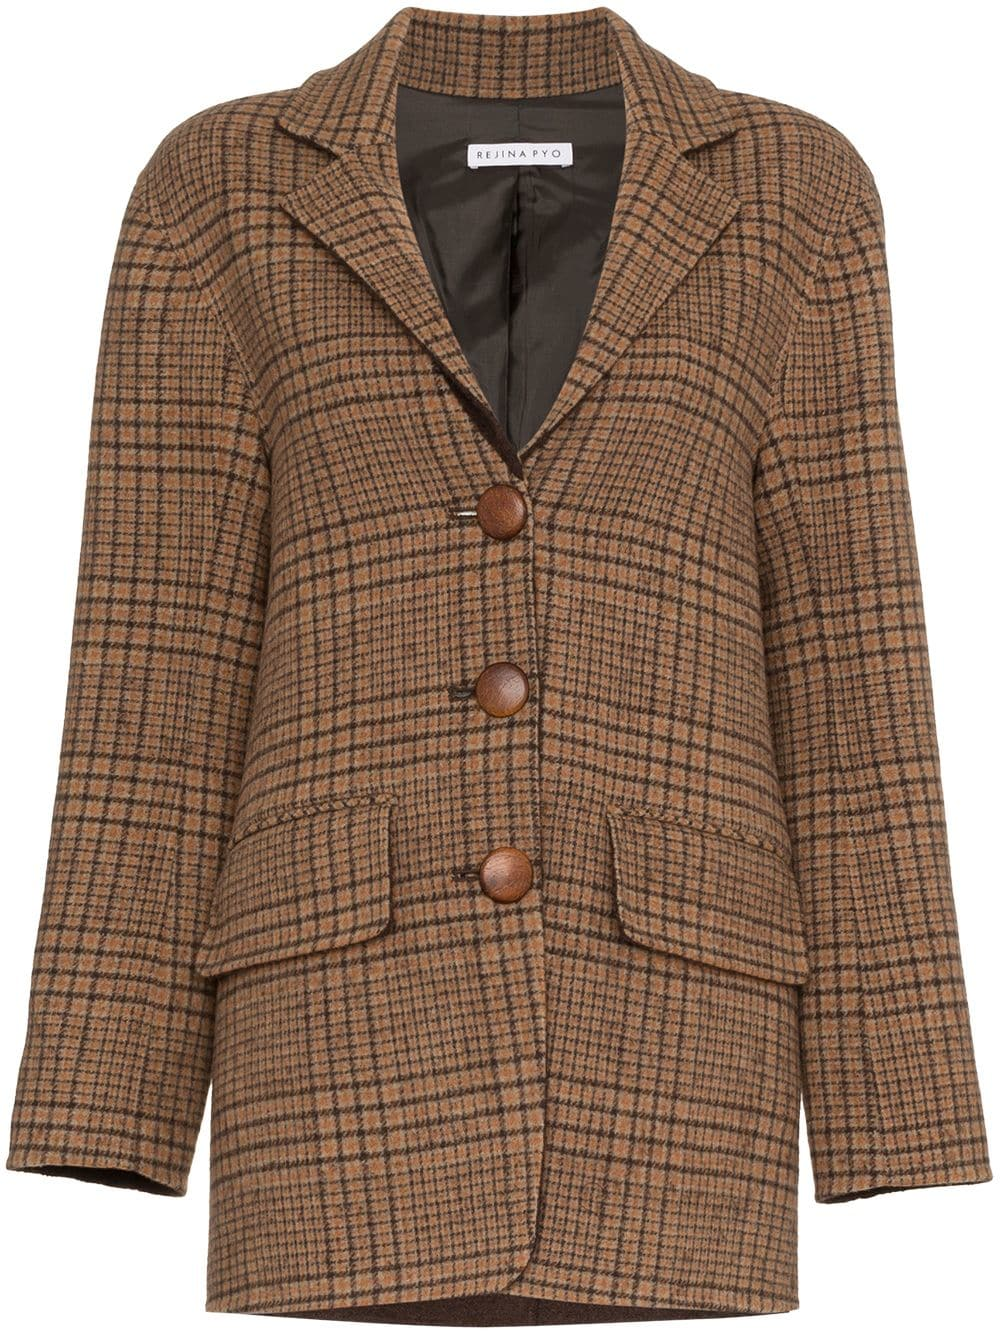 Rejina Pyocheck wool blazer - shop